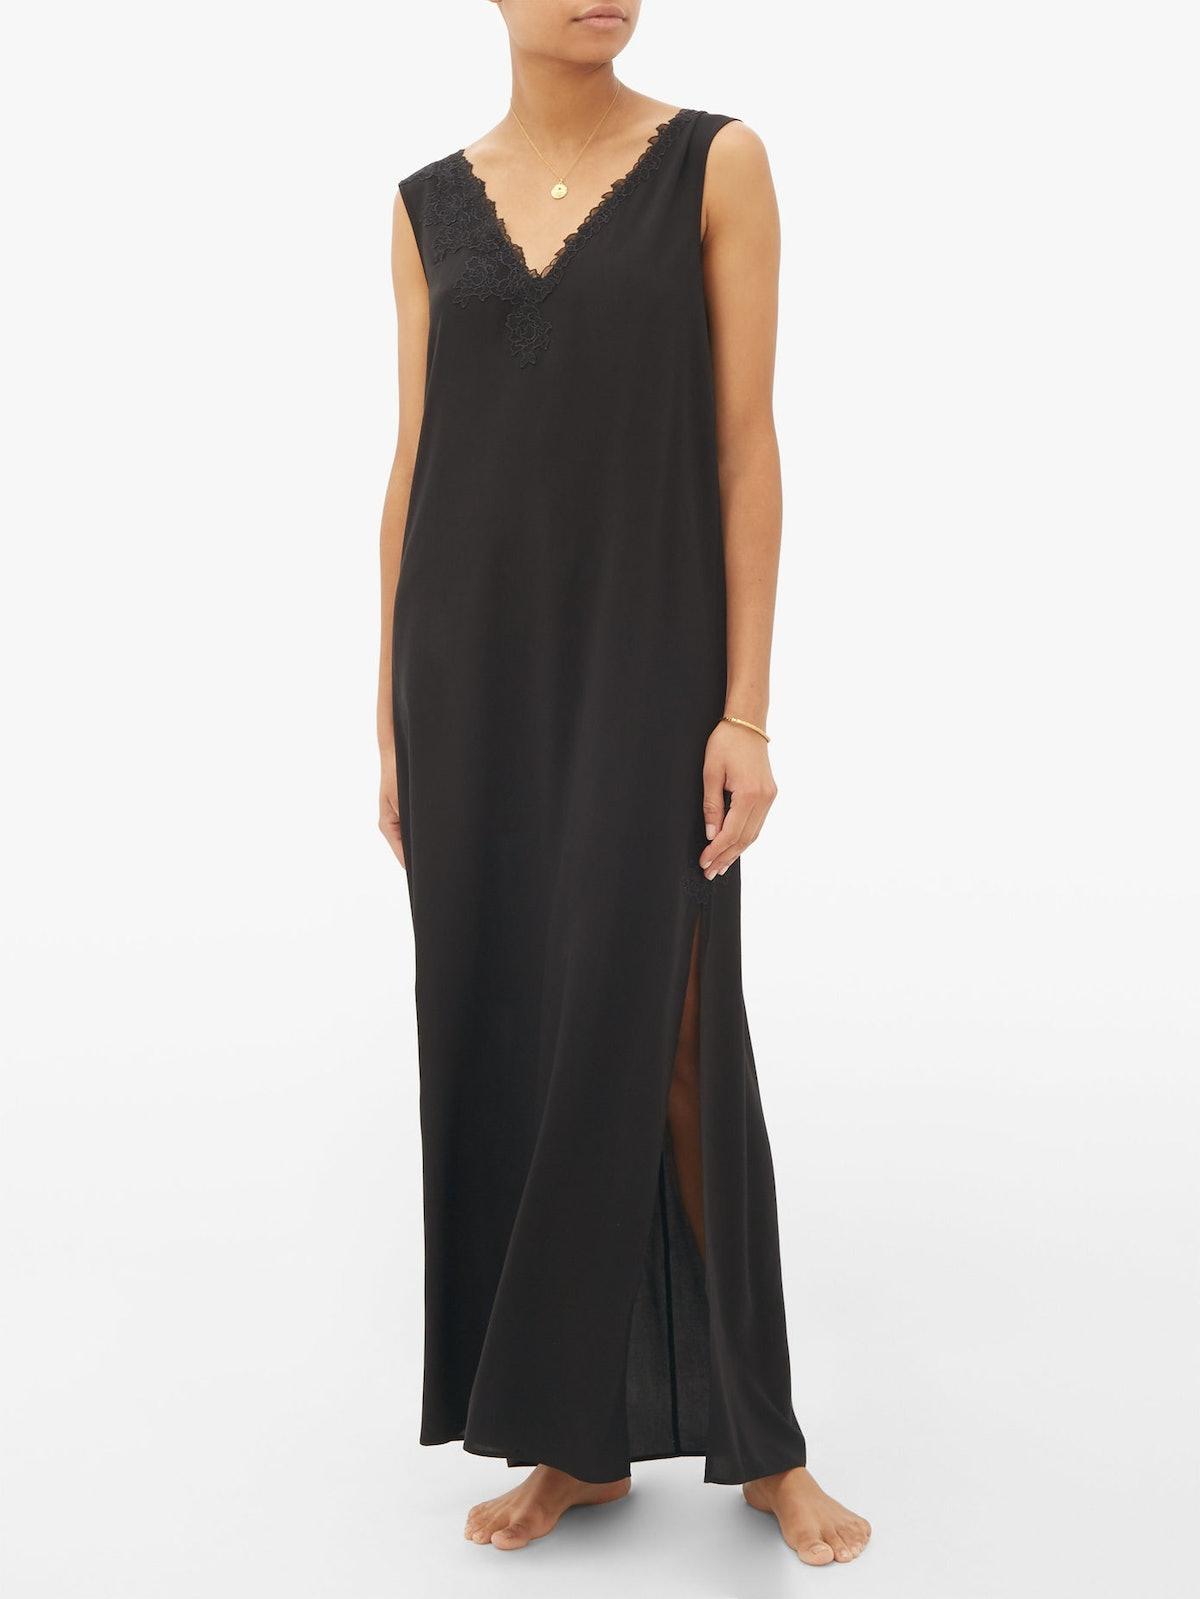 Bella Lace-Applique Nightgown